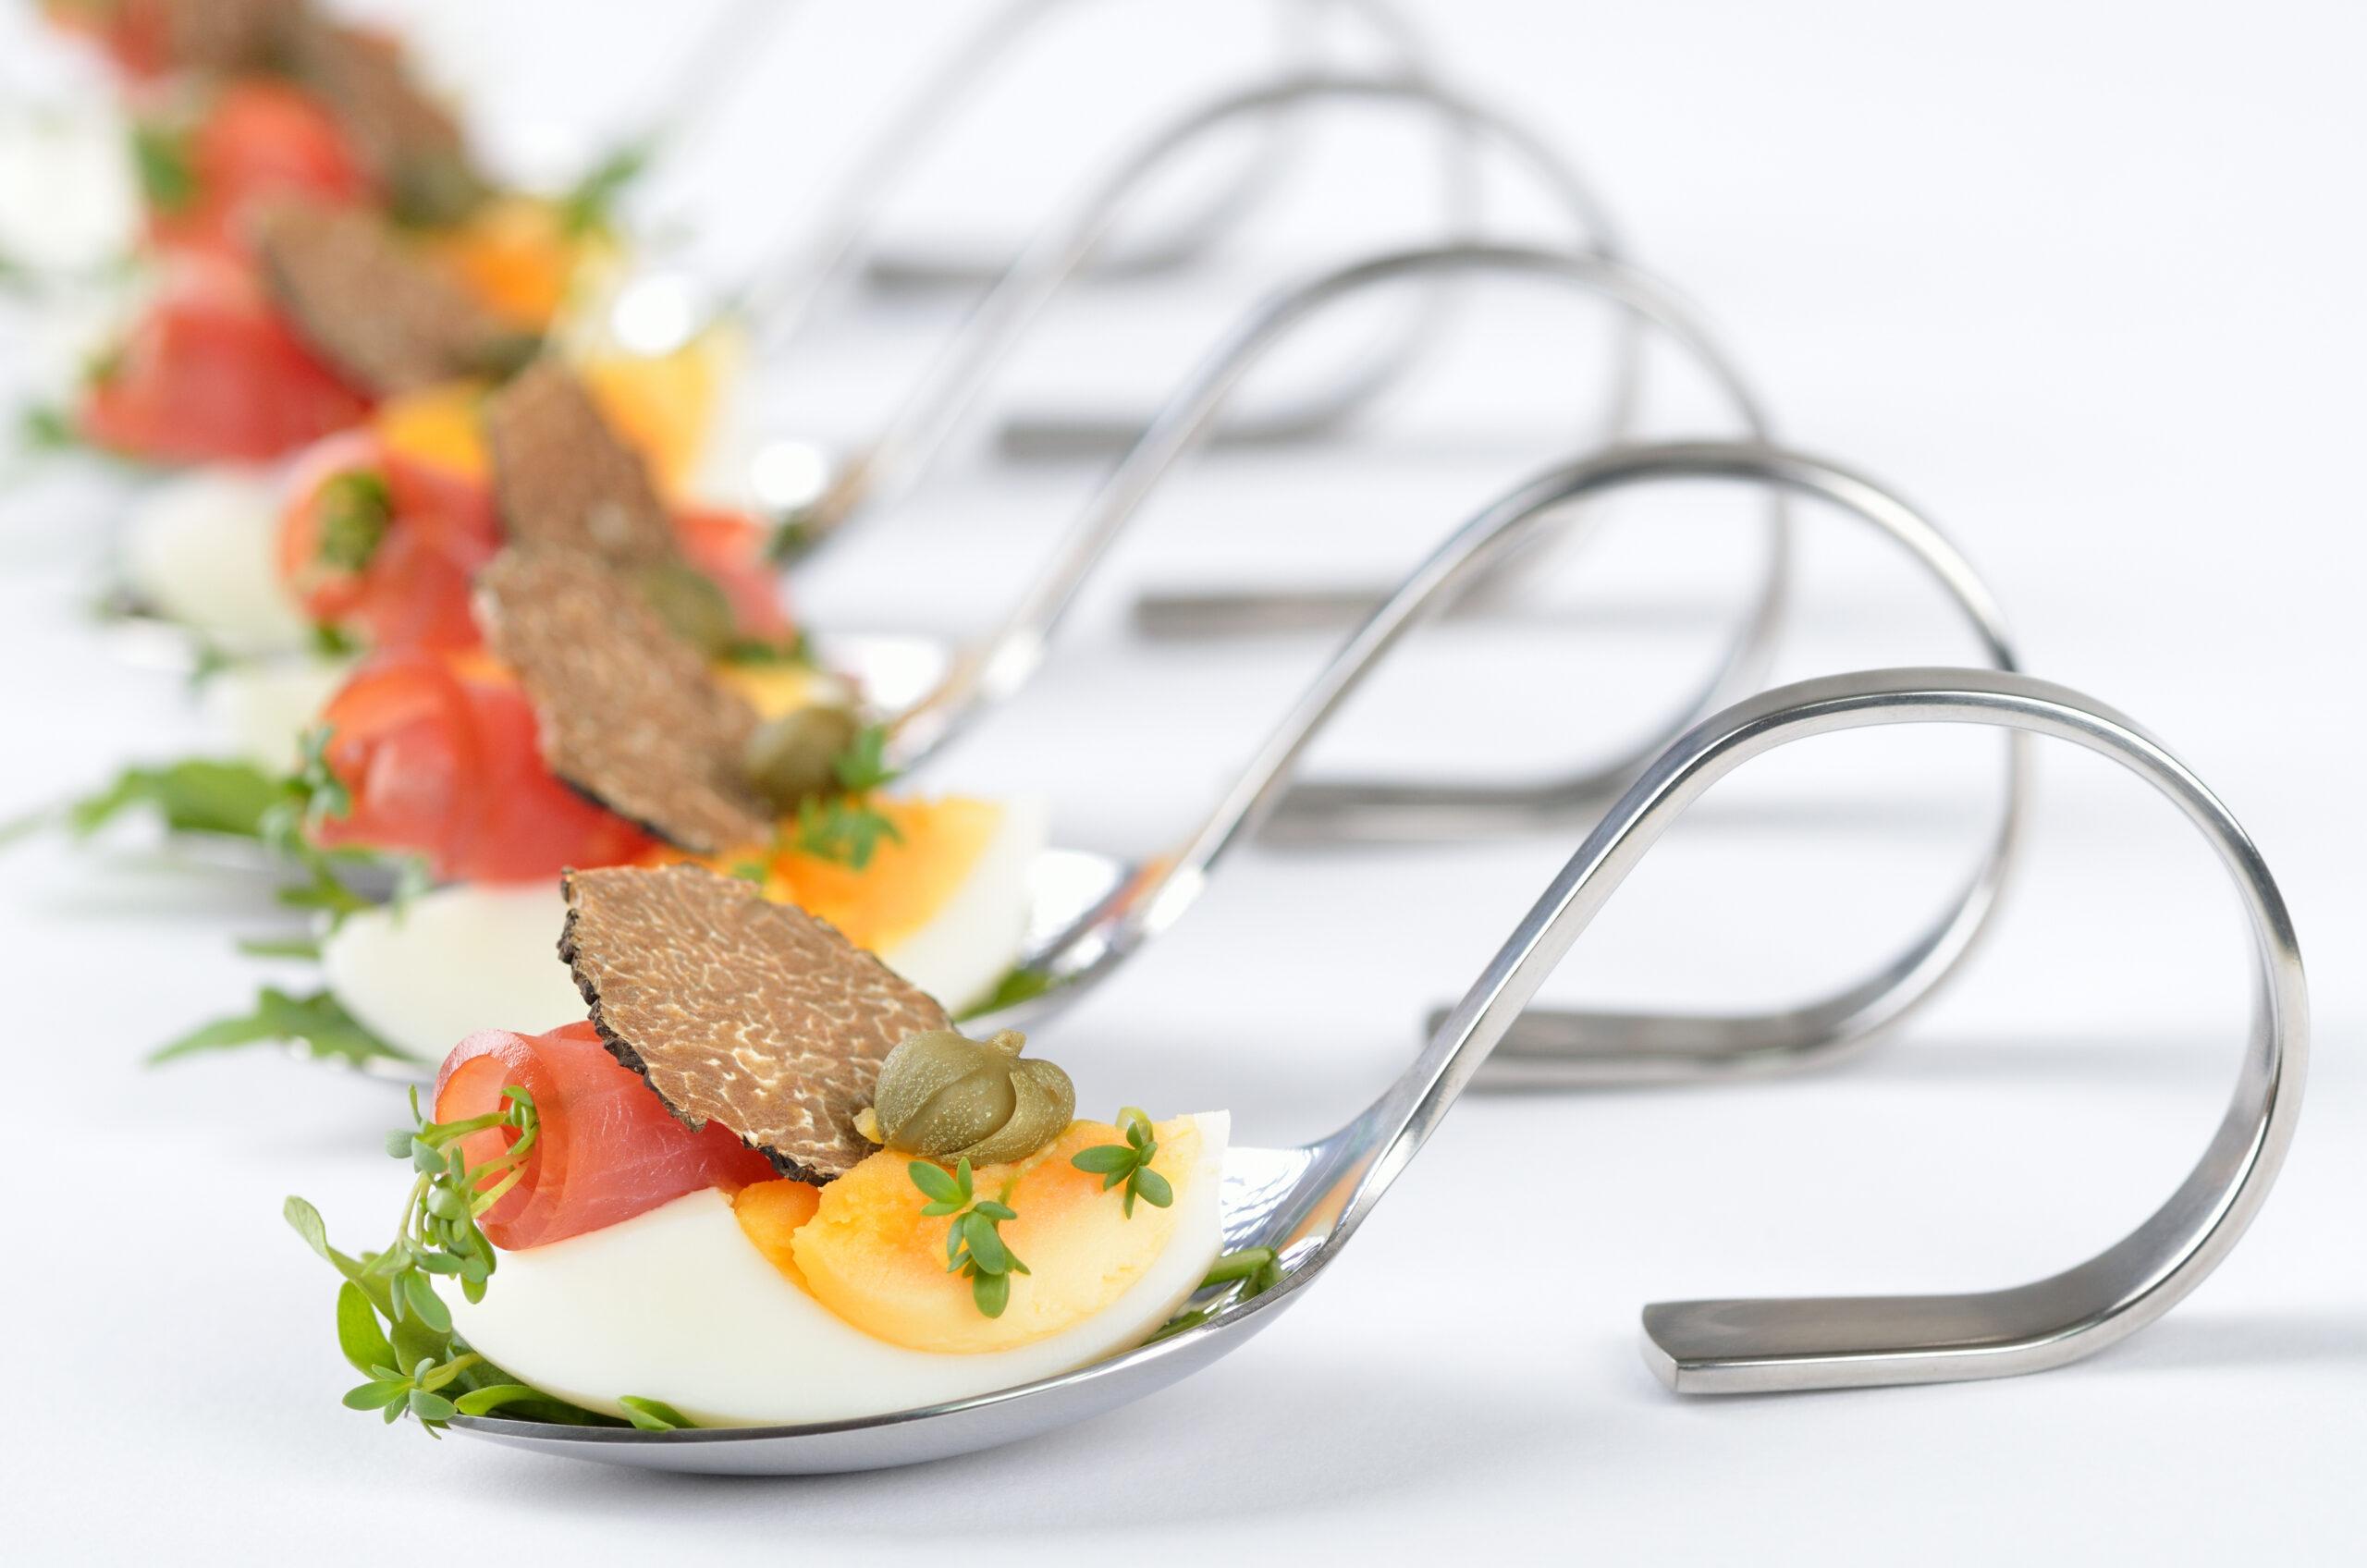 tartufo e uova gourmet 2